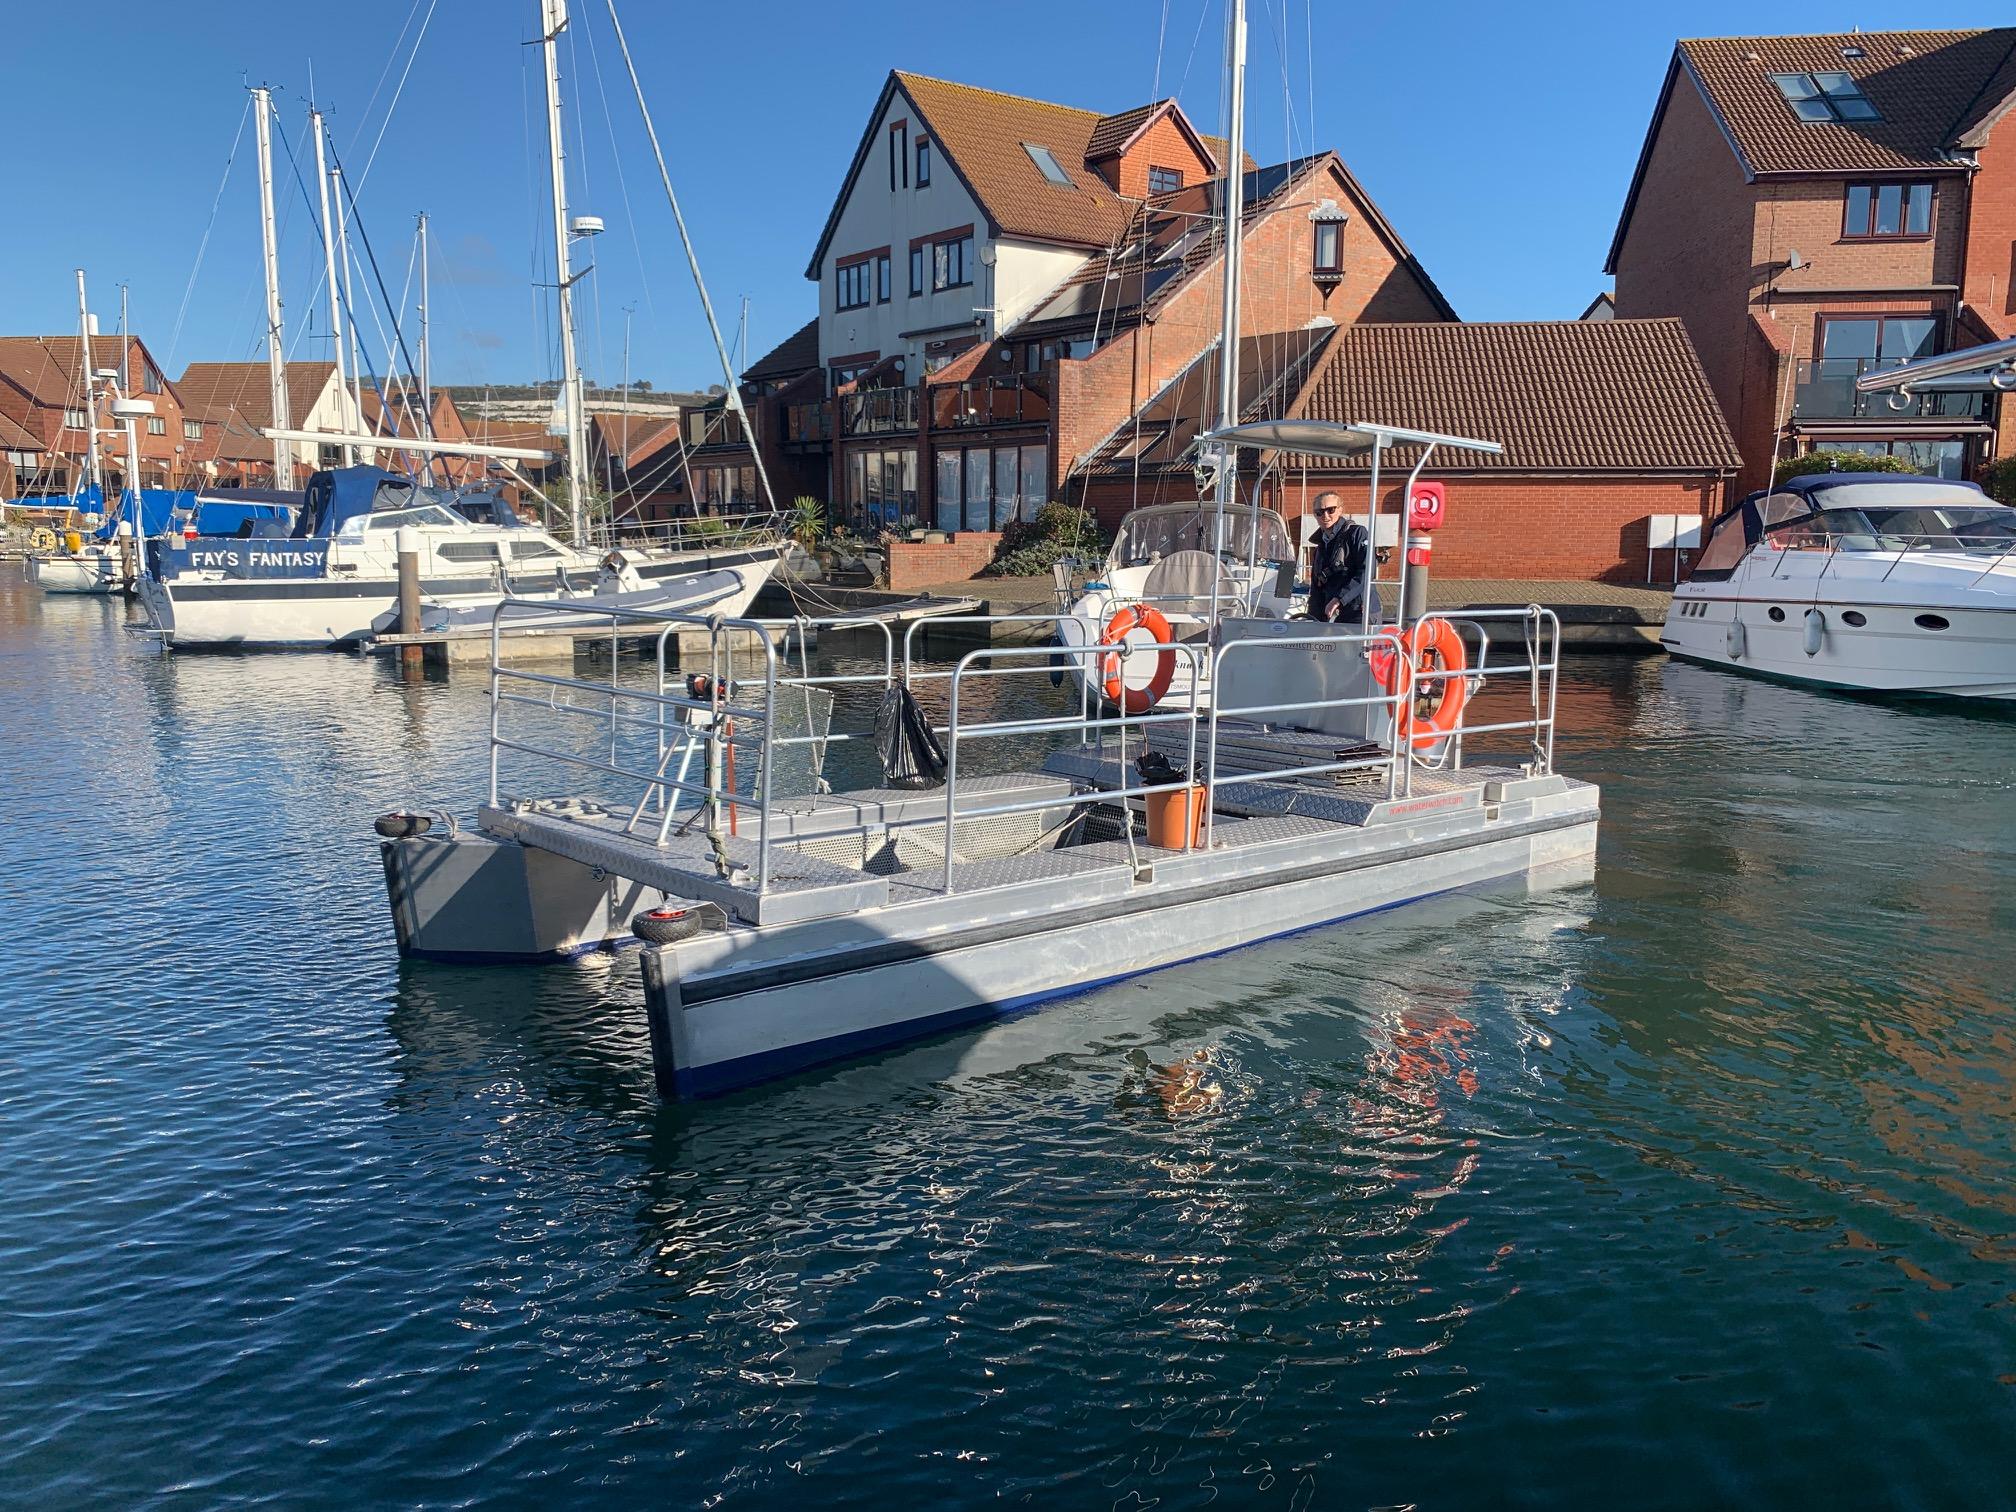 Trash skimmer boat, litter collection boat, marine debris recovery boat